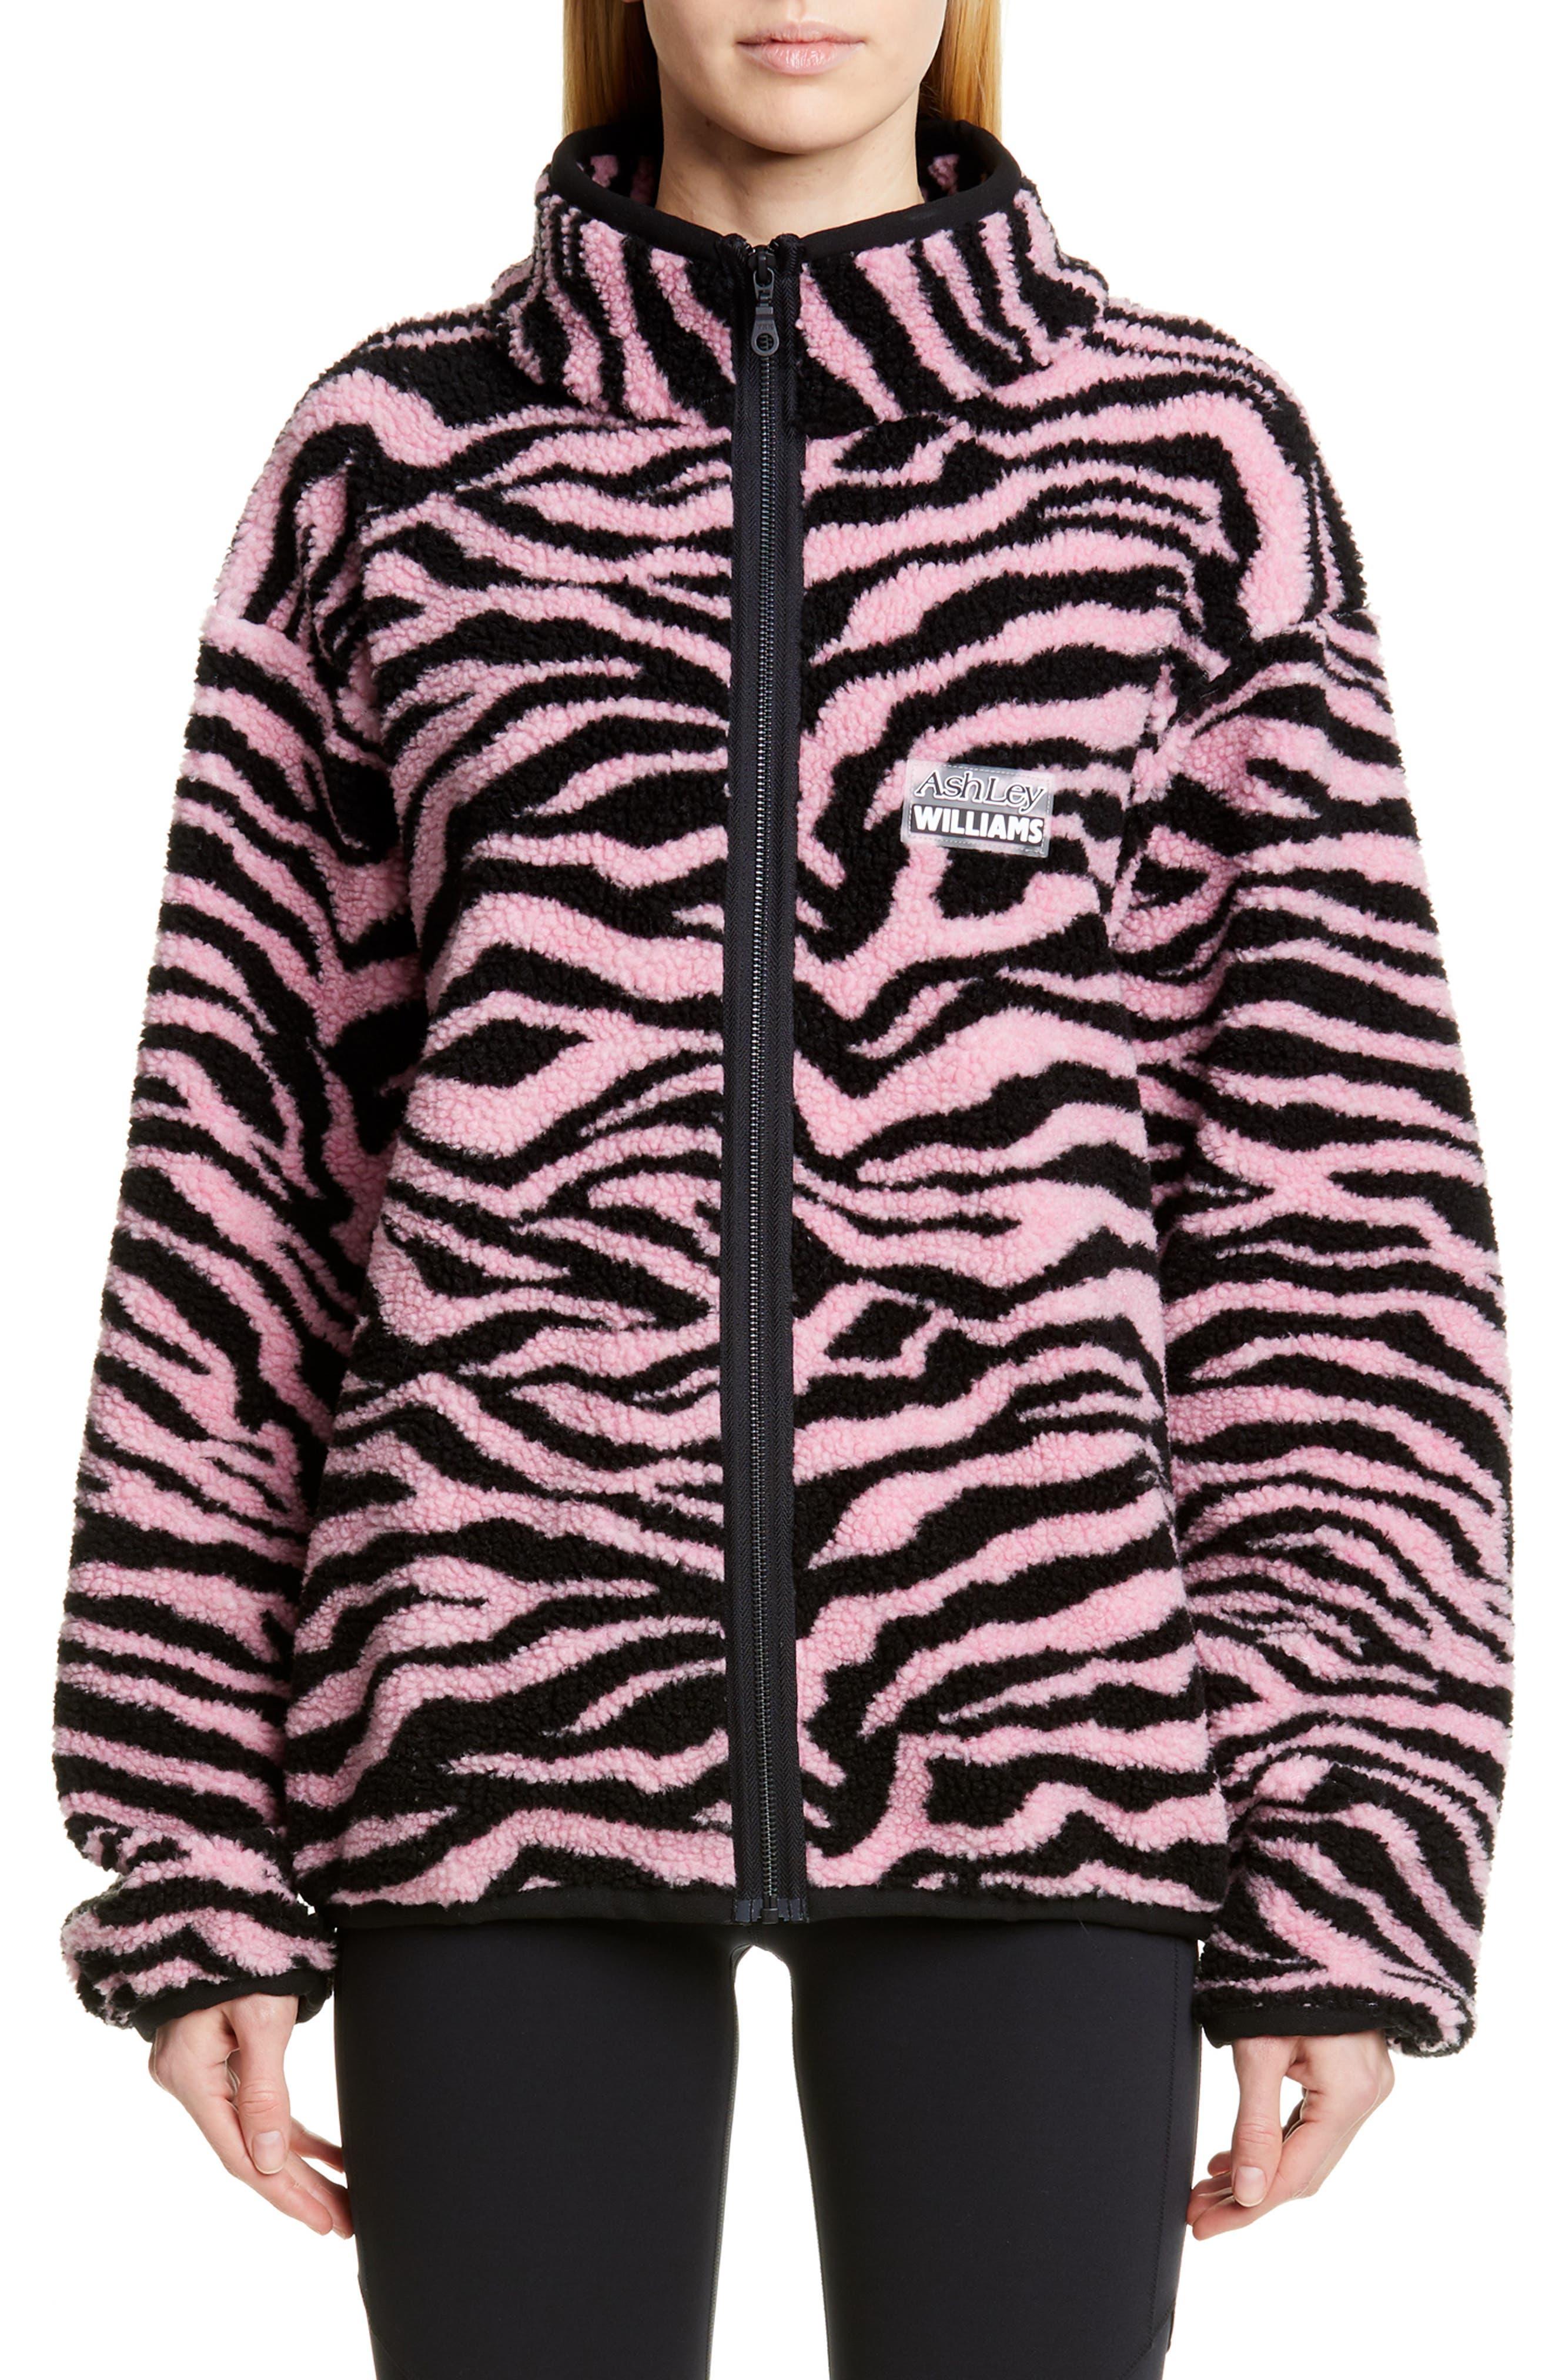 Ashley Williams Juju Tiger Print Fleece Jacket, Pink